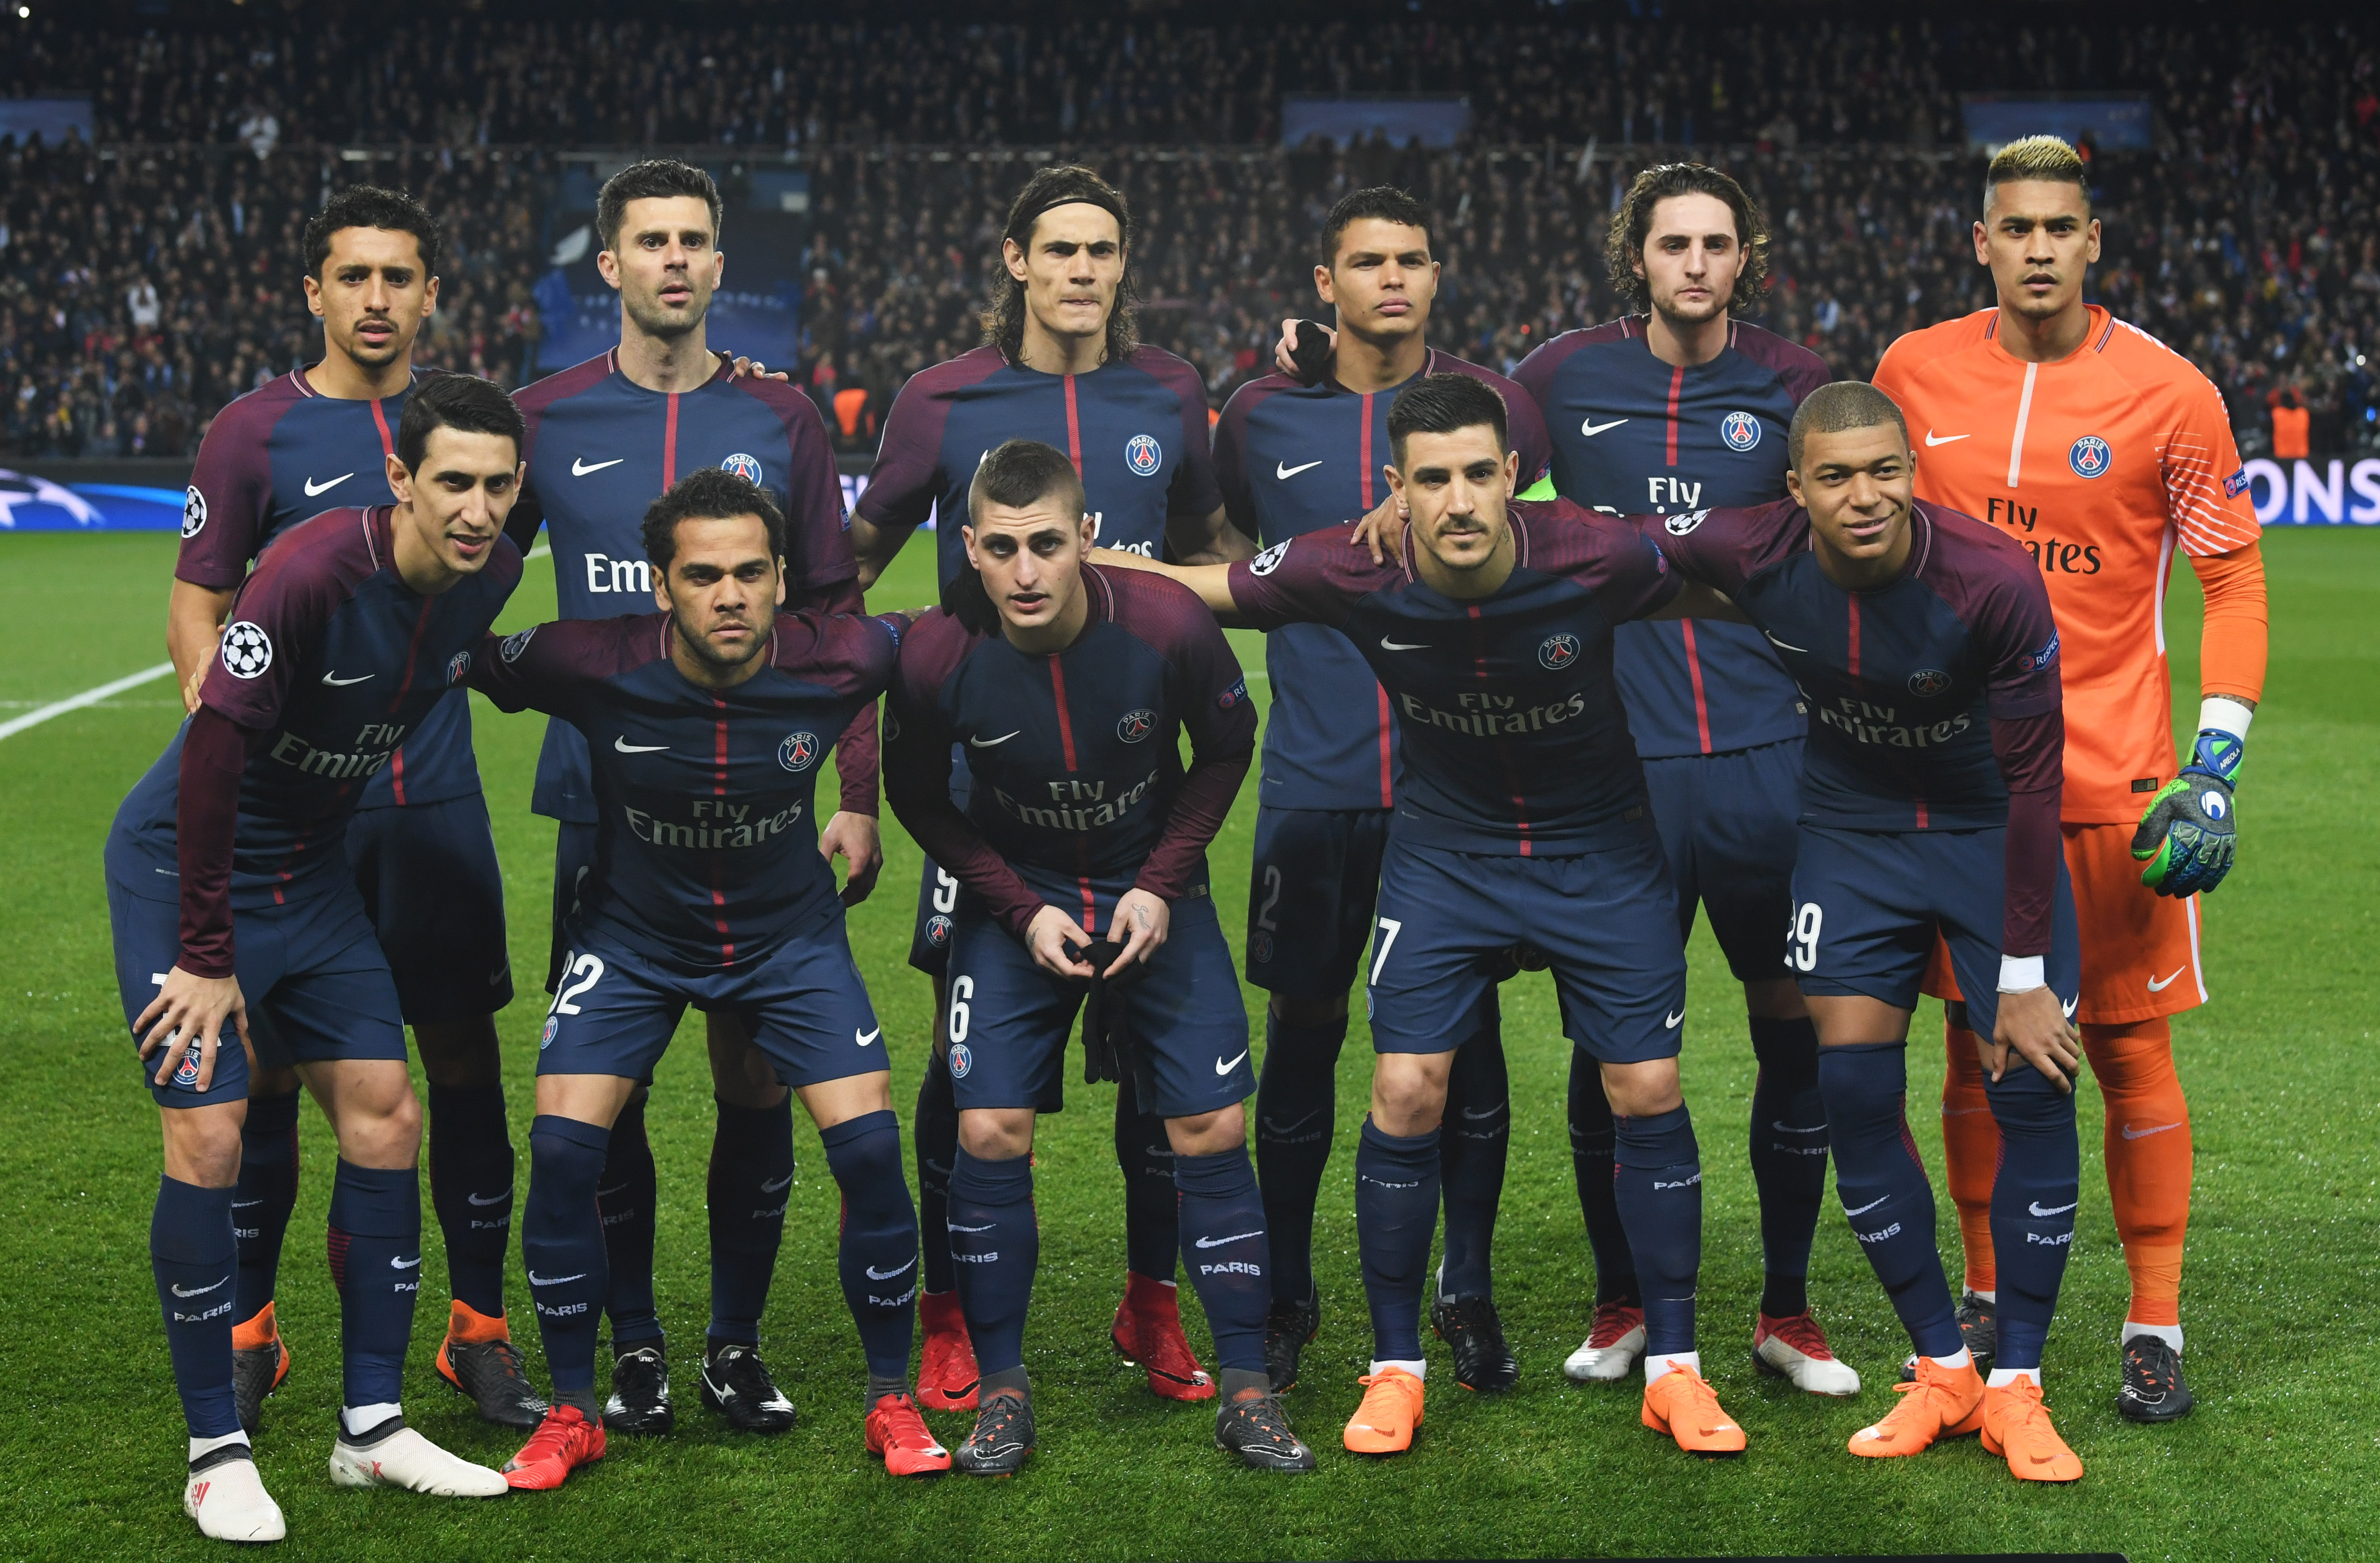 PSG Barcelona Suárez Coutinho Messi Los Pleyers